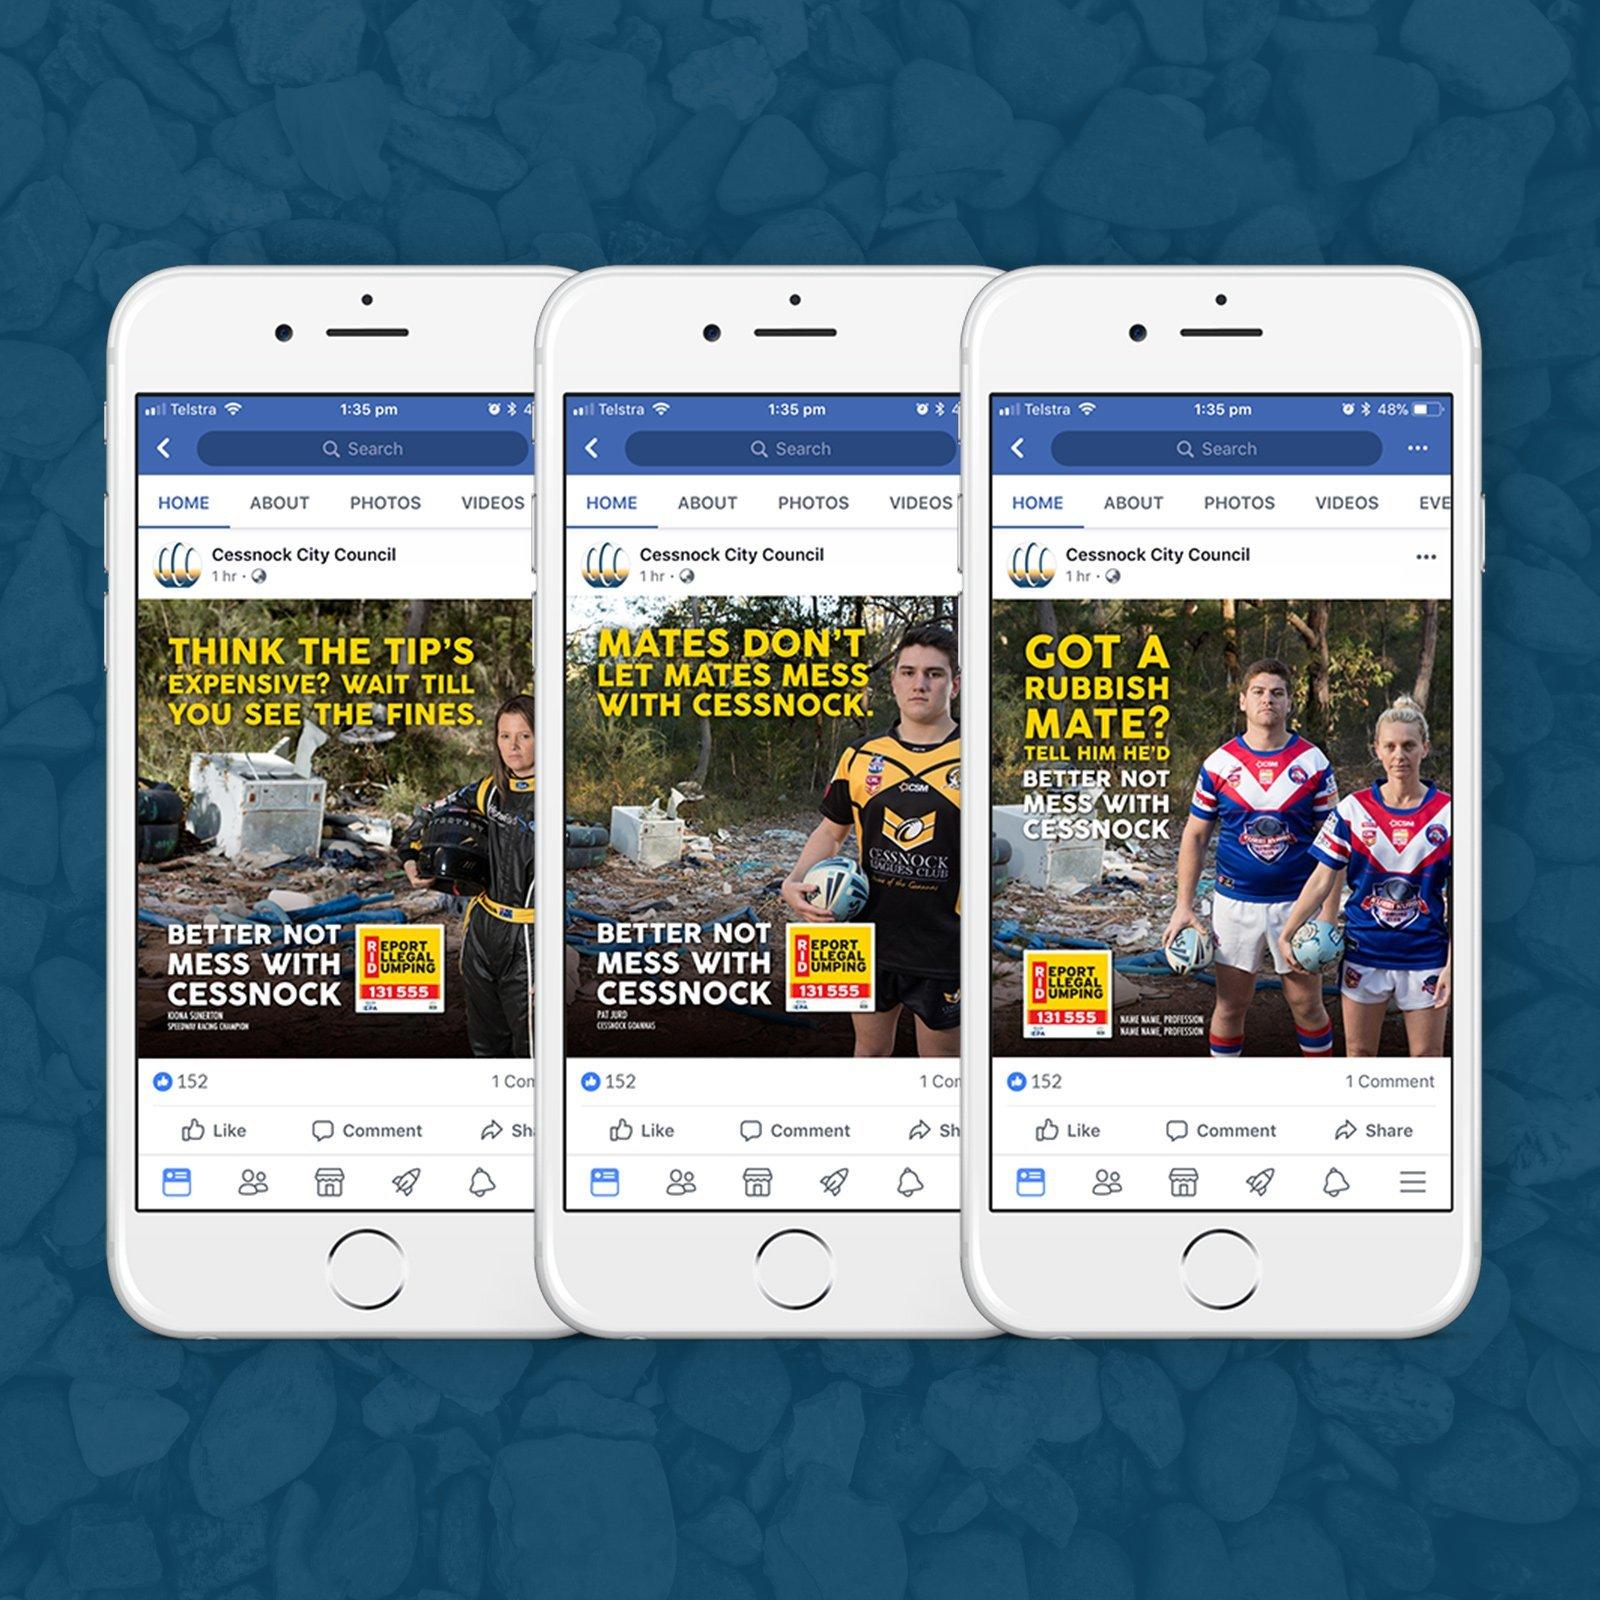 Cessnock City Council Illegal Dumping Social Media Campaign